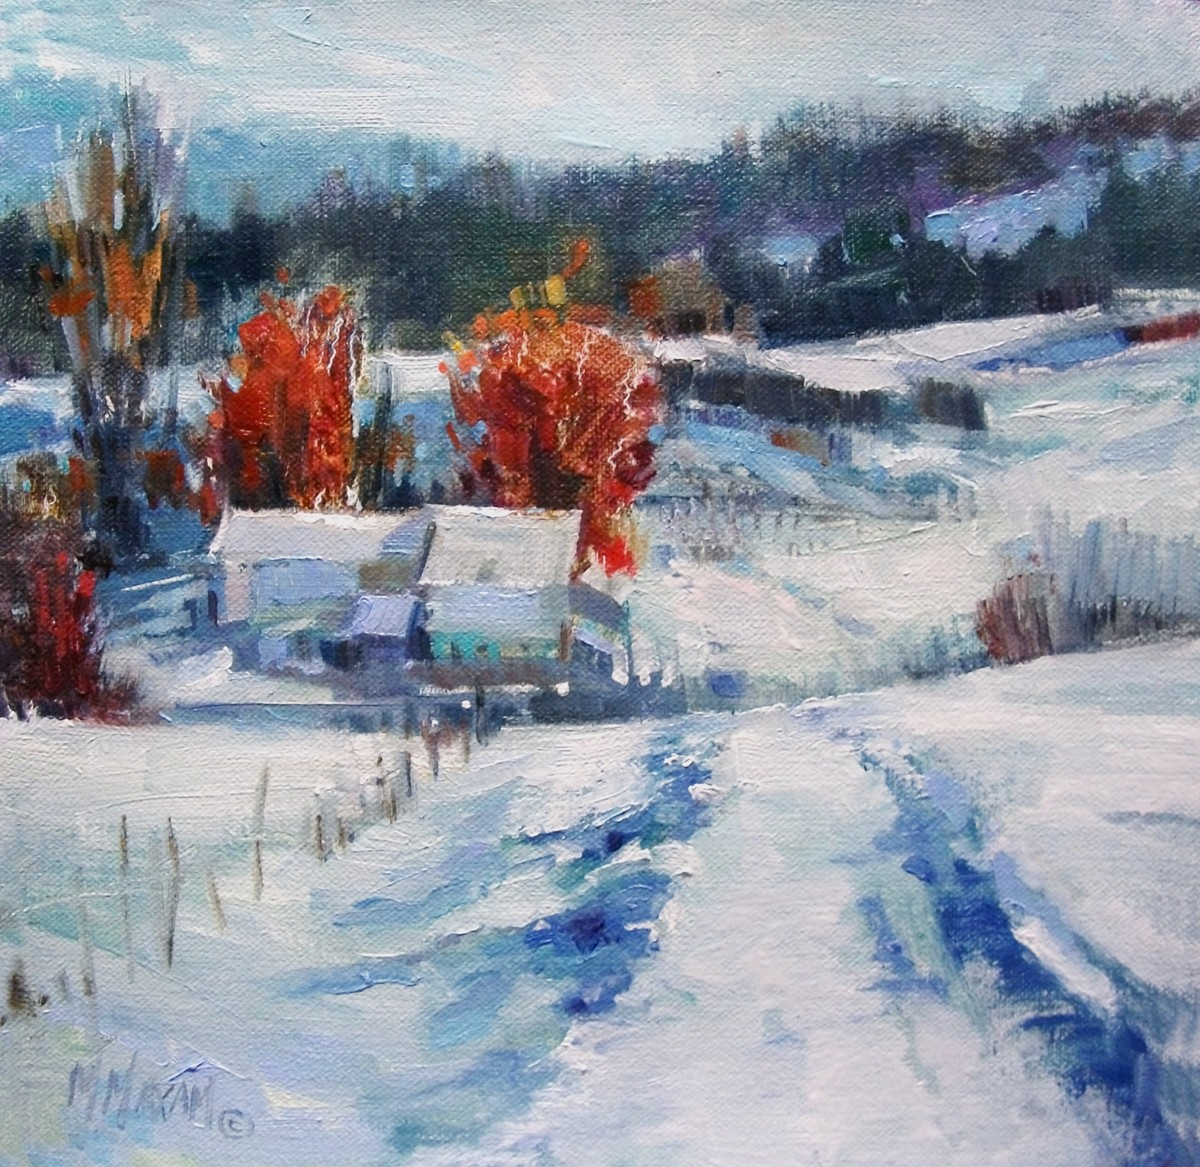 http://2.bp.blogspot.com/_9mvl7e41Wj4/TQlavRchyqI/AAAAAAAAAn4/Kg9ITjFGO9o/s1600/Snowy%2BFarm%2BView.jpg